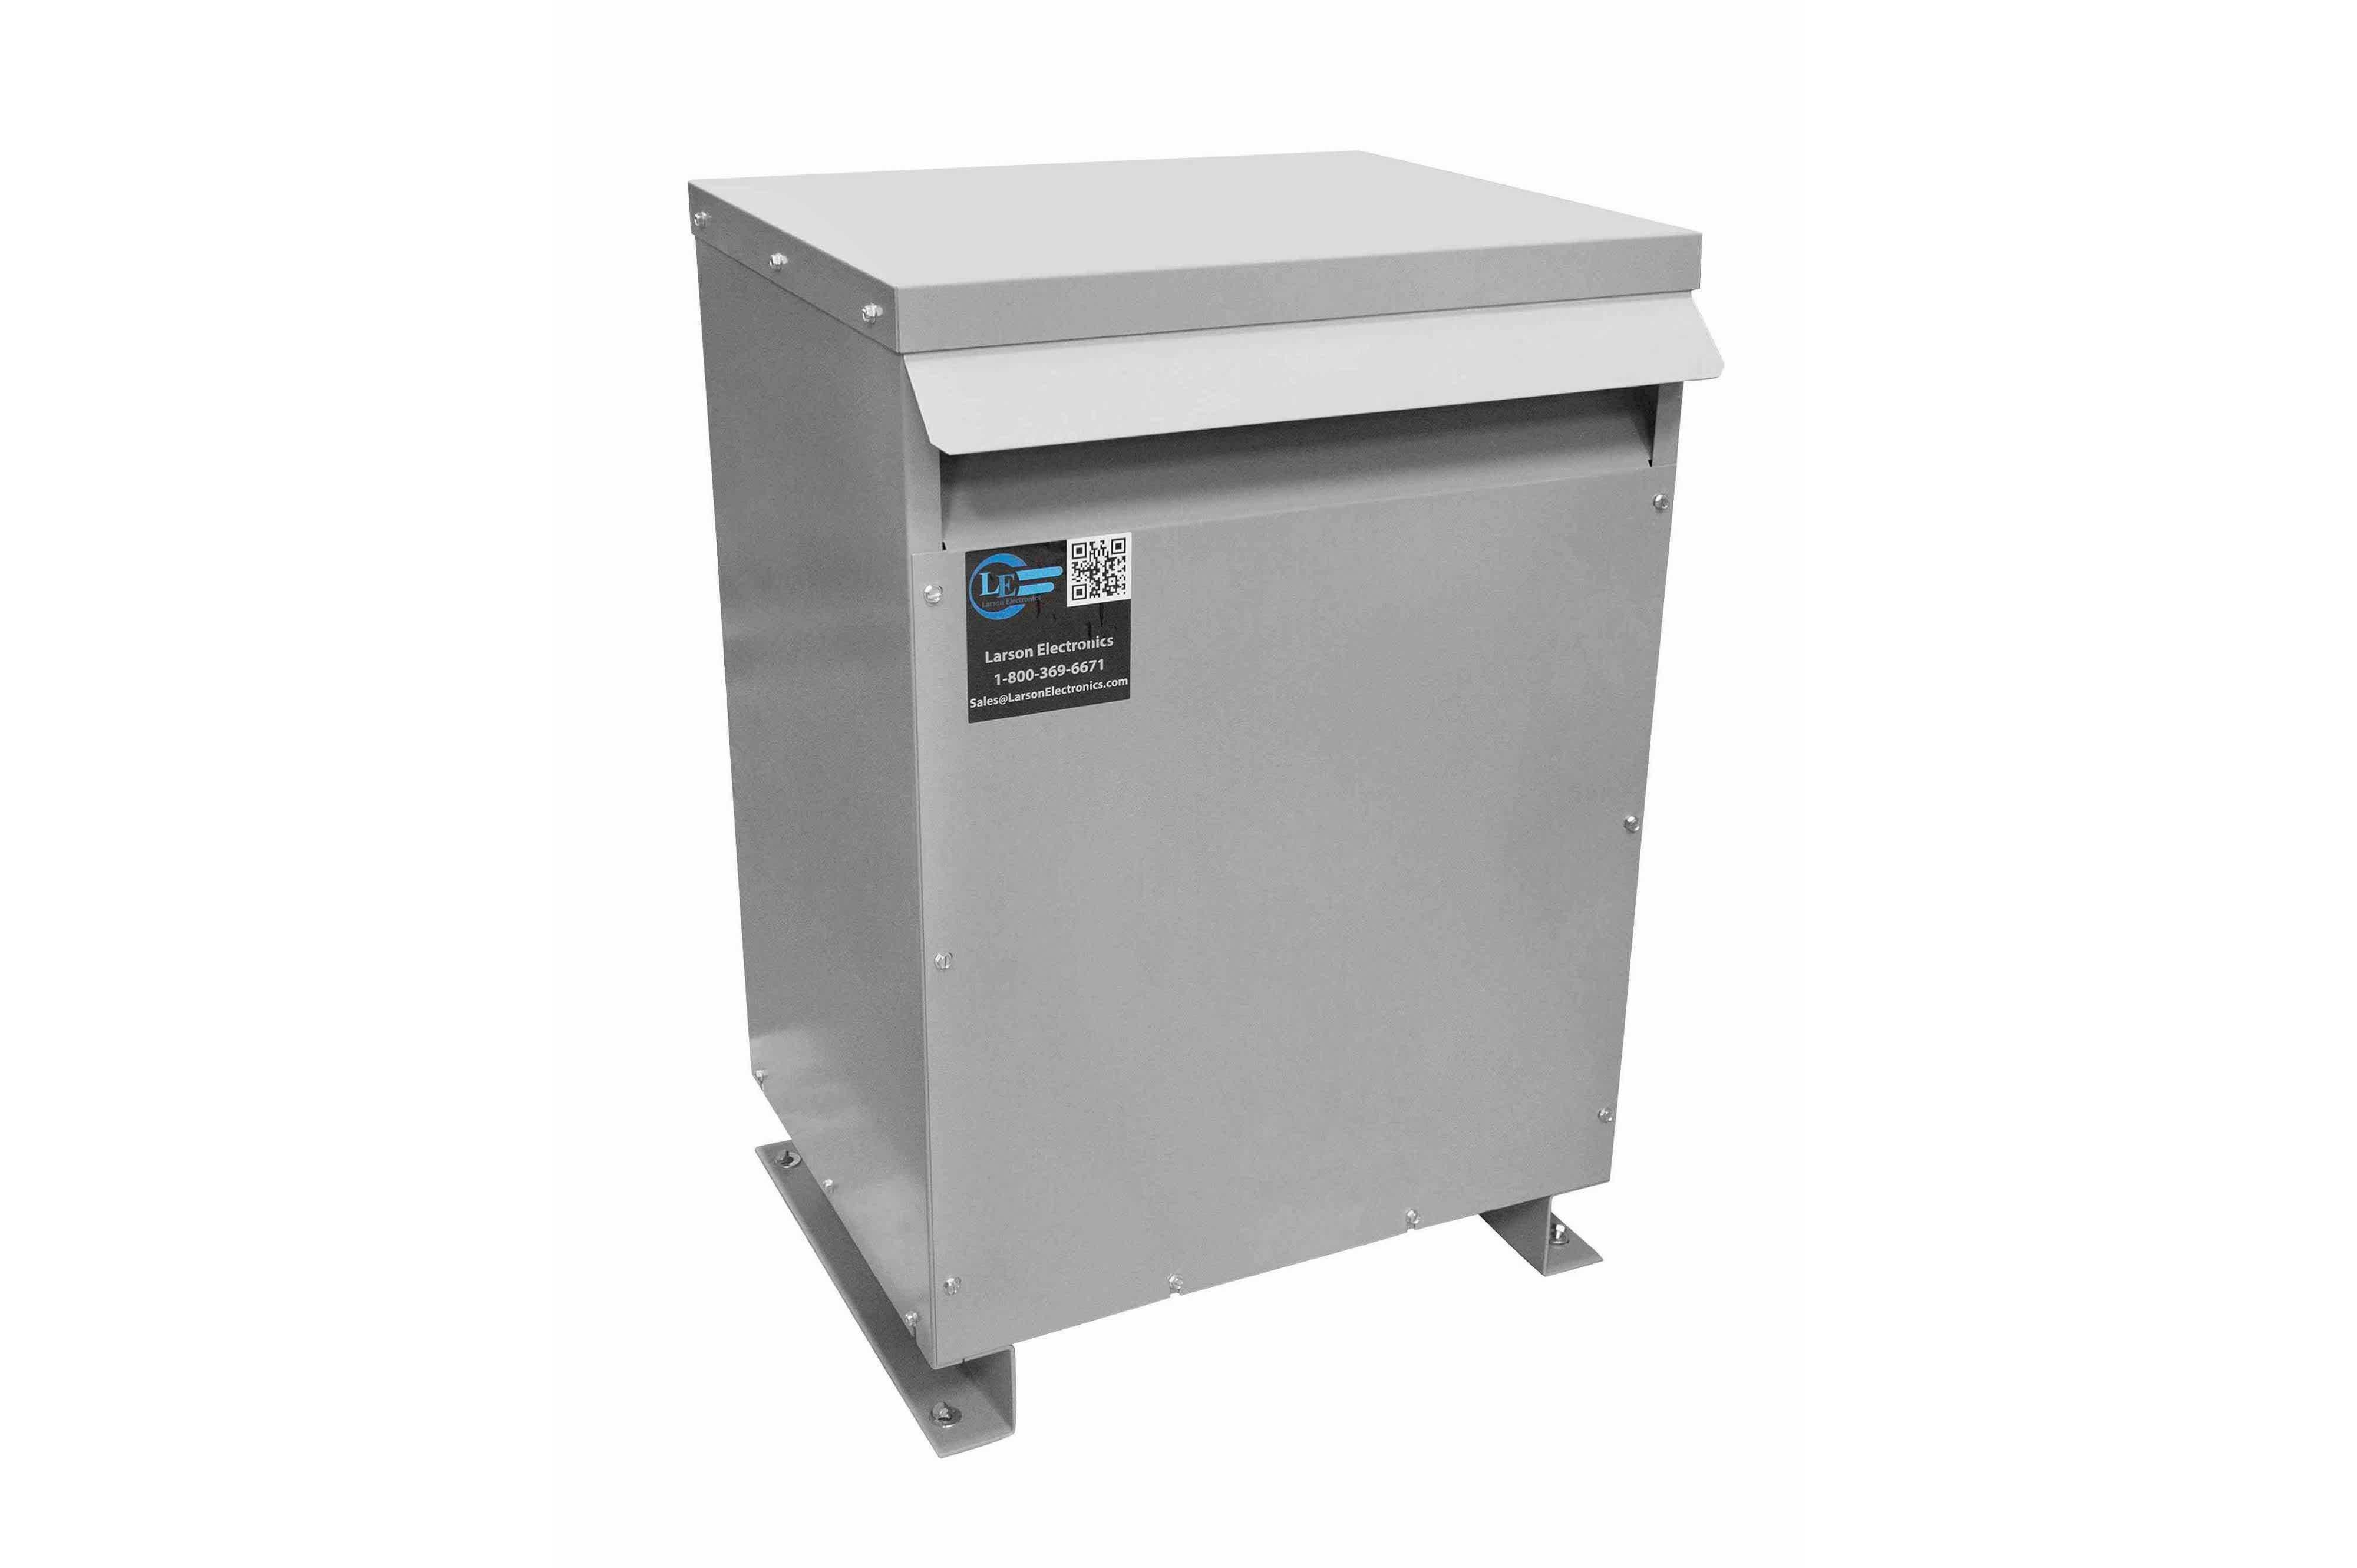 225 kVA 3PH Isolation Transformer, 600V Wye Primary, 480Y/277 Wye-N Secondary, N3R, Ventilated, 60 Hz